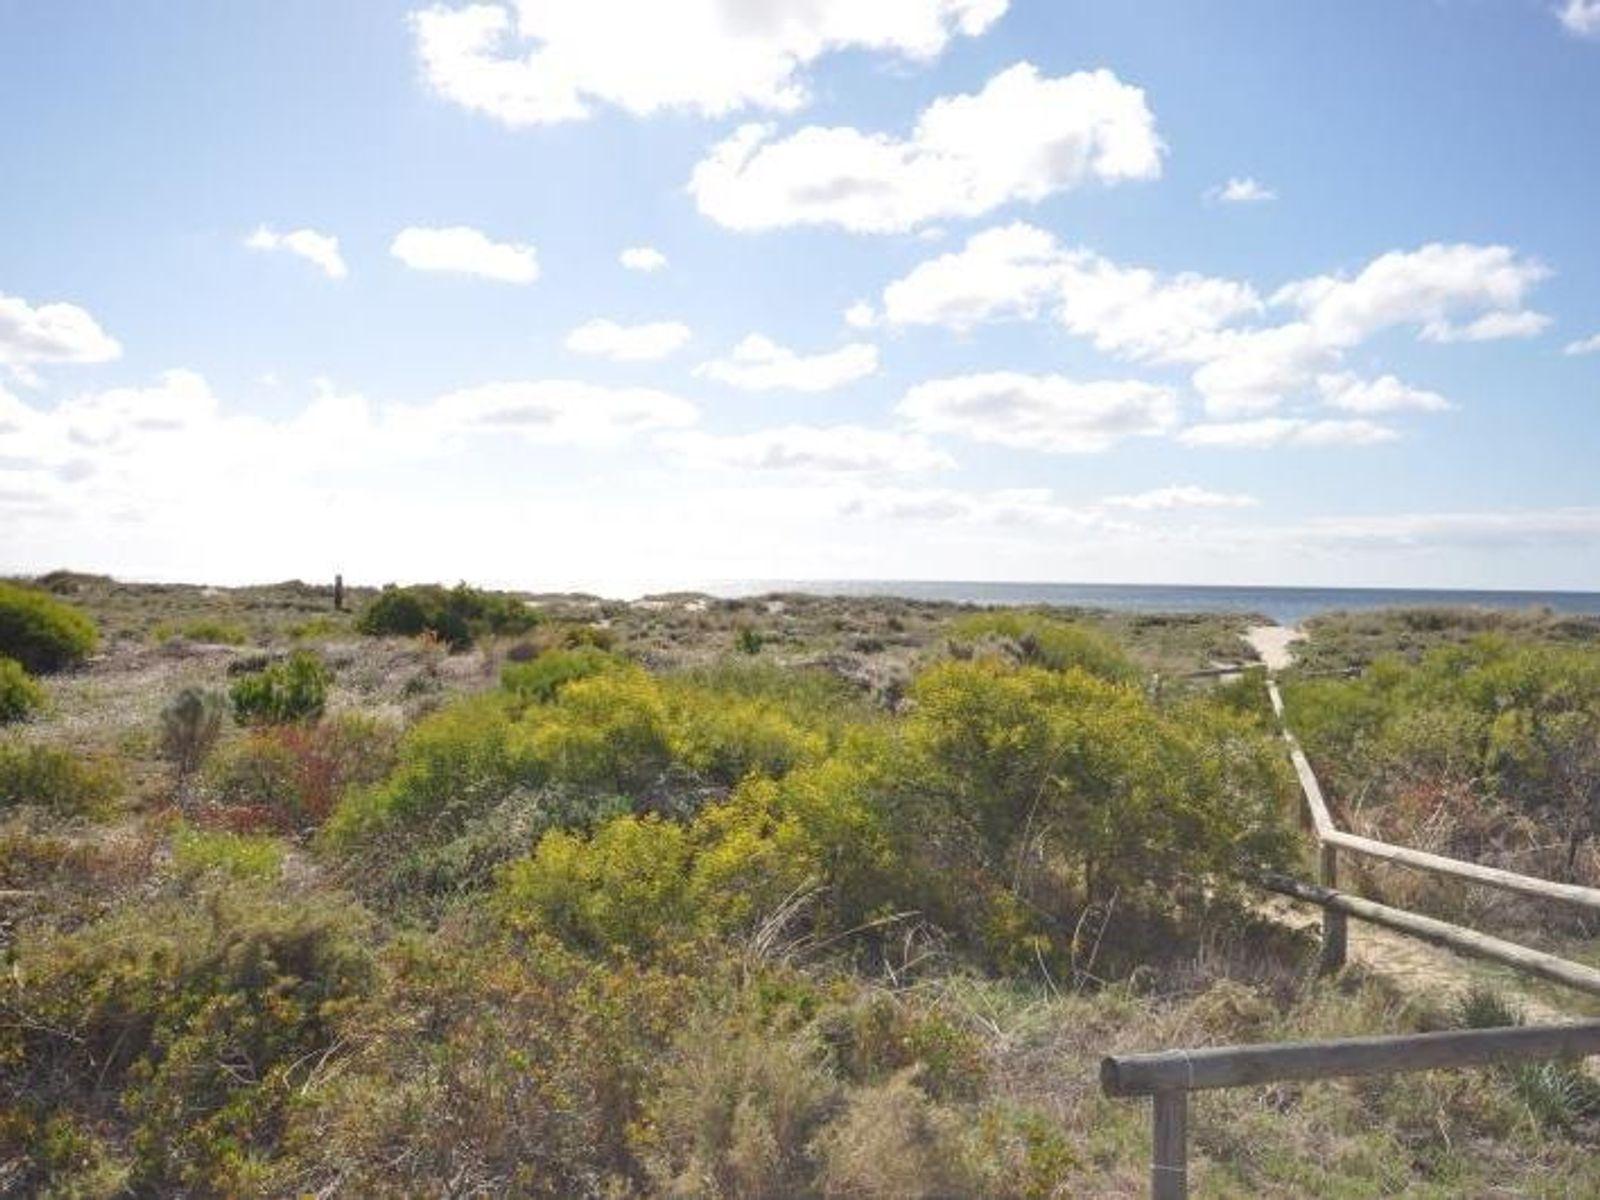 1016 Geographe Bay Road, Geographe, WA 6280